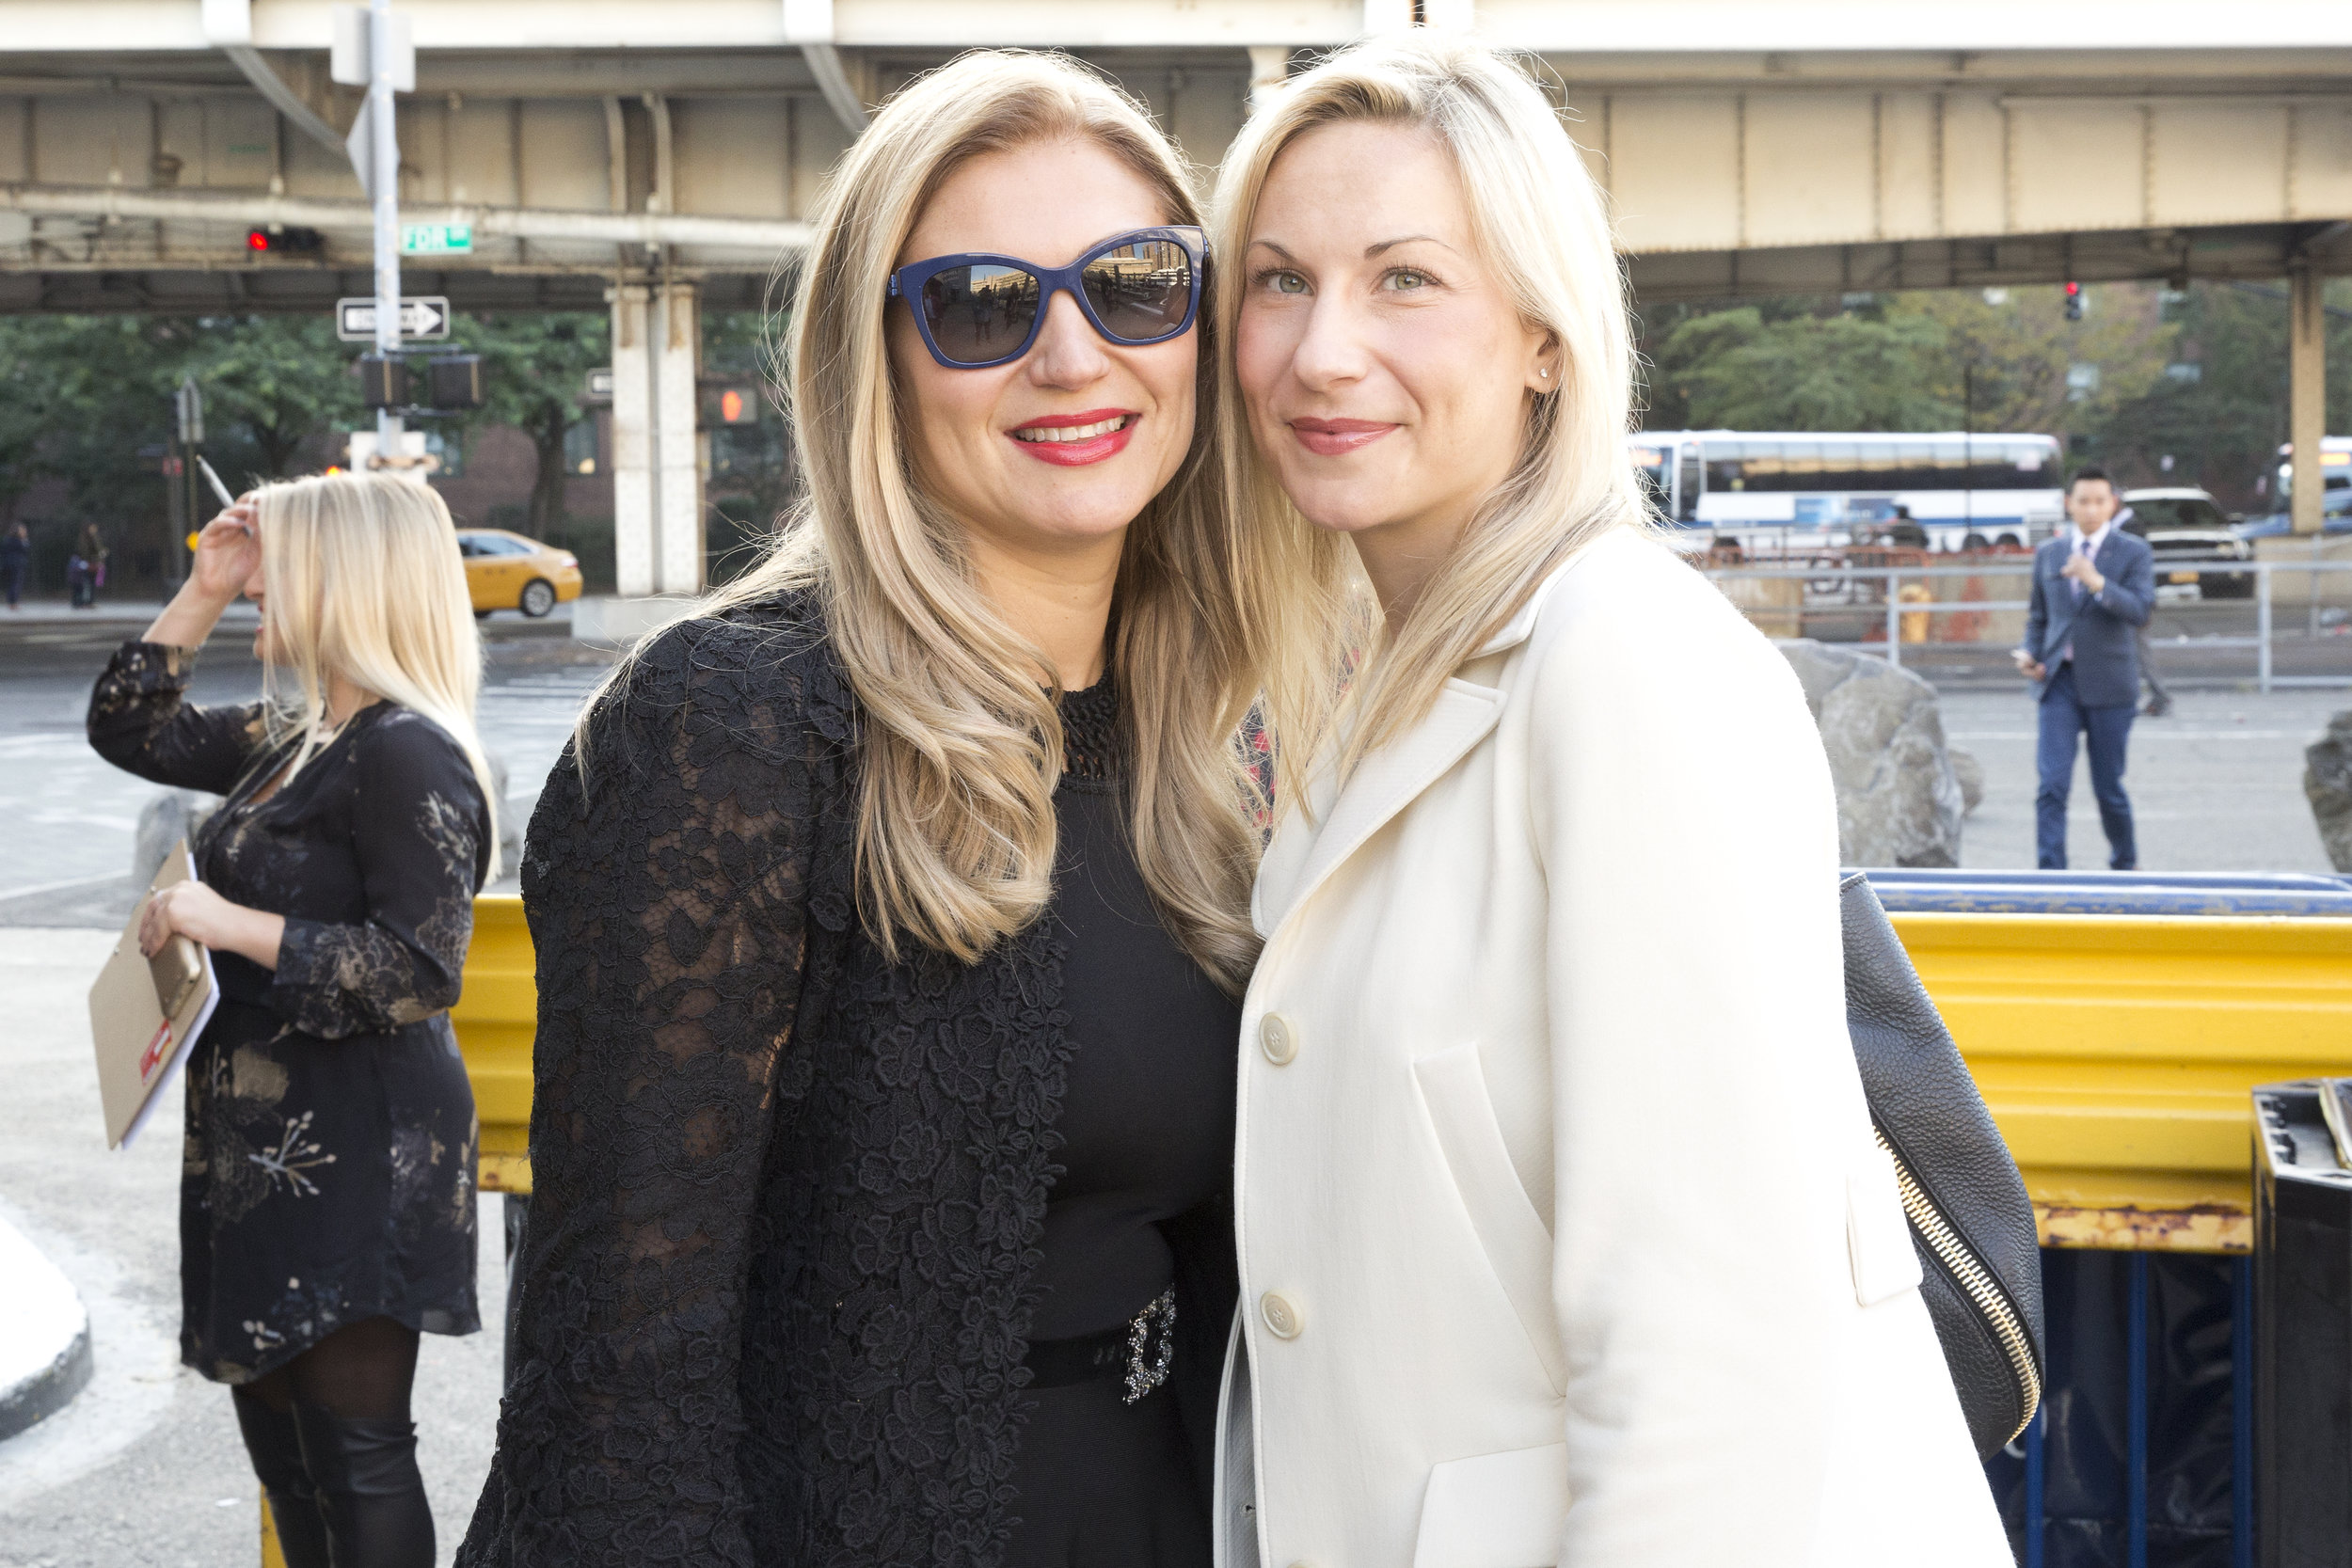 Maria Babaev, Alison Maiore.jpg